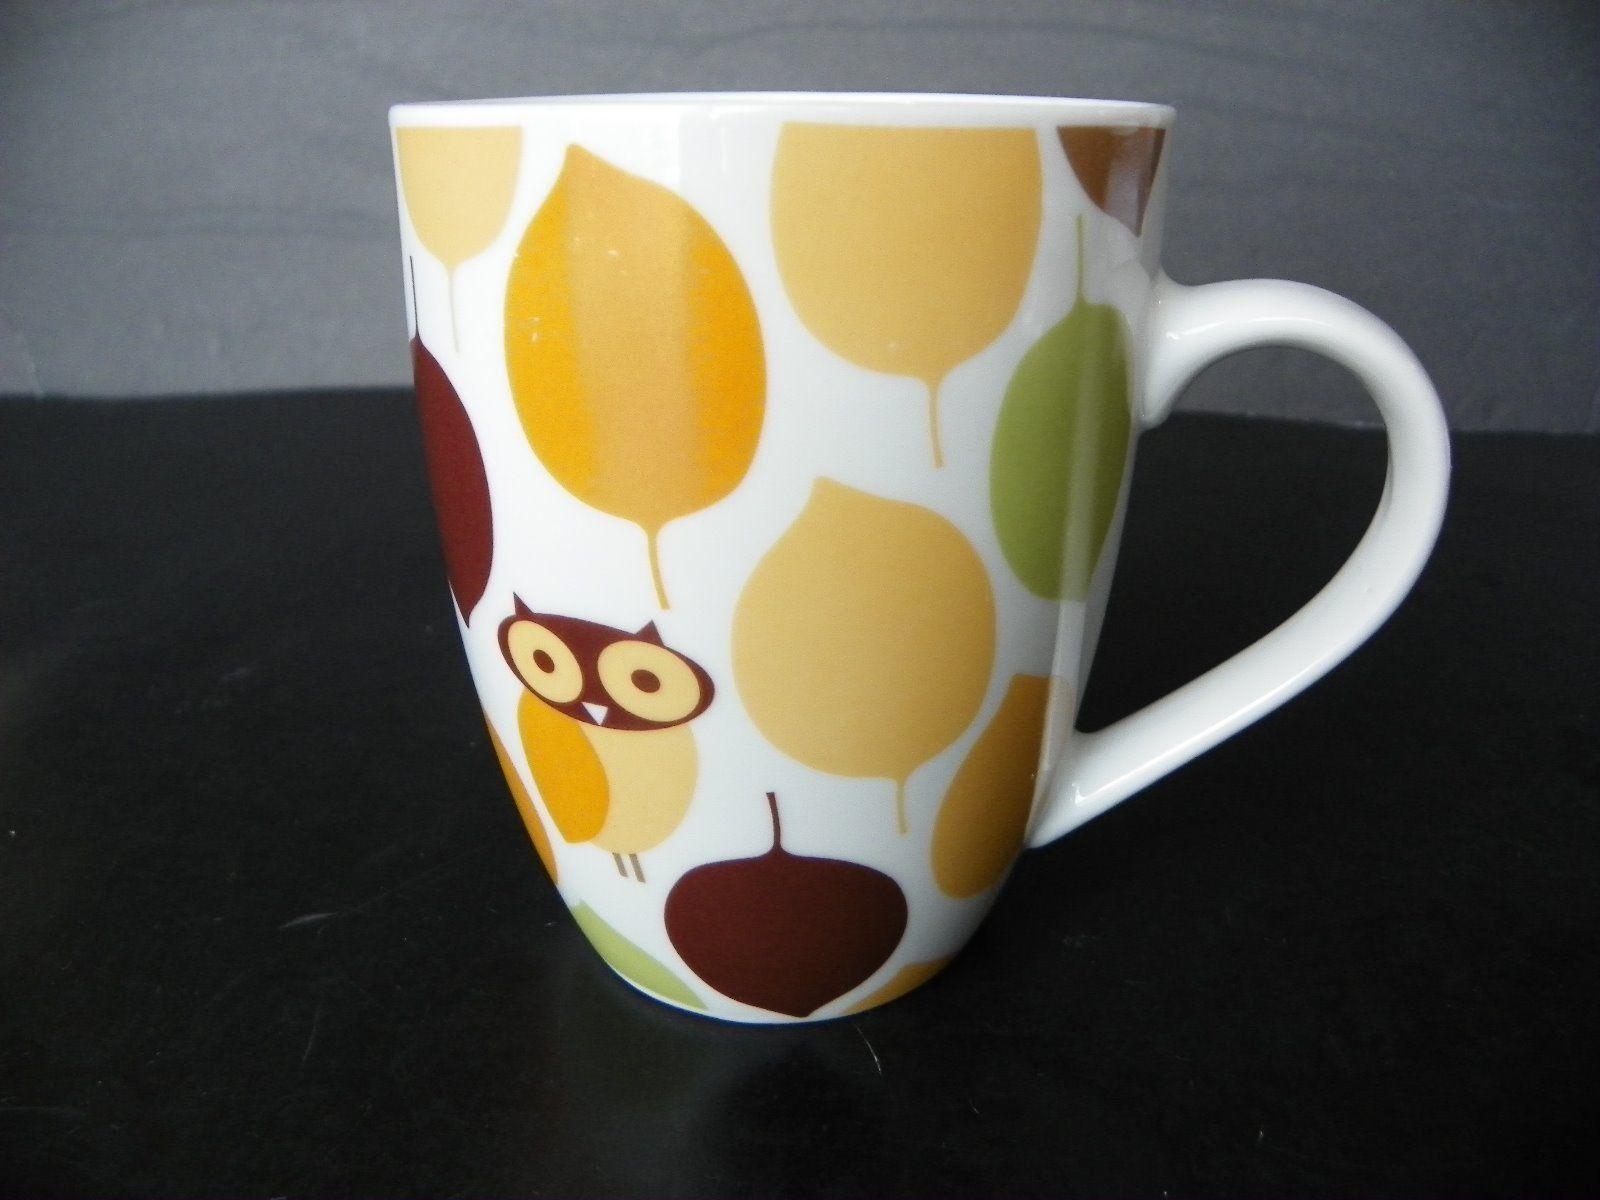 Rachael Ray Little Hoot Coffee Mug Discontinued 6 55